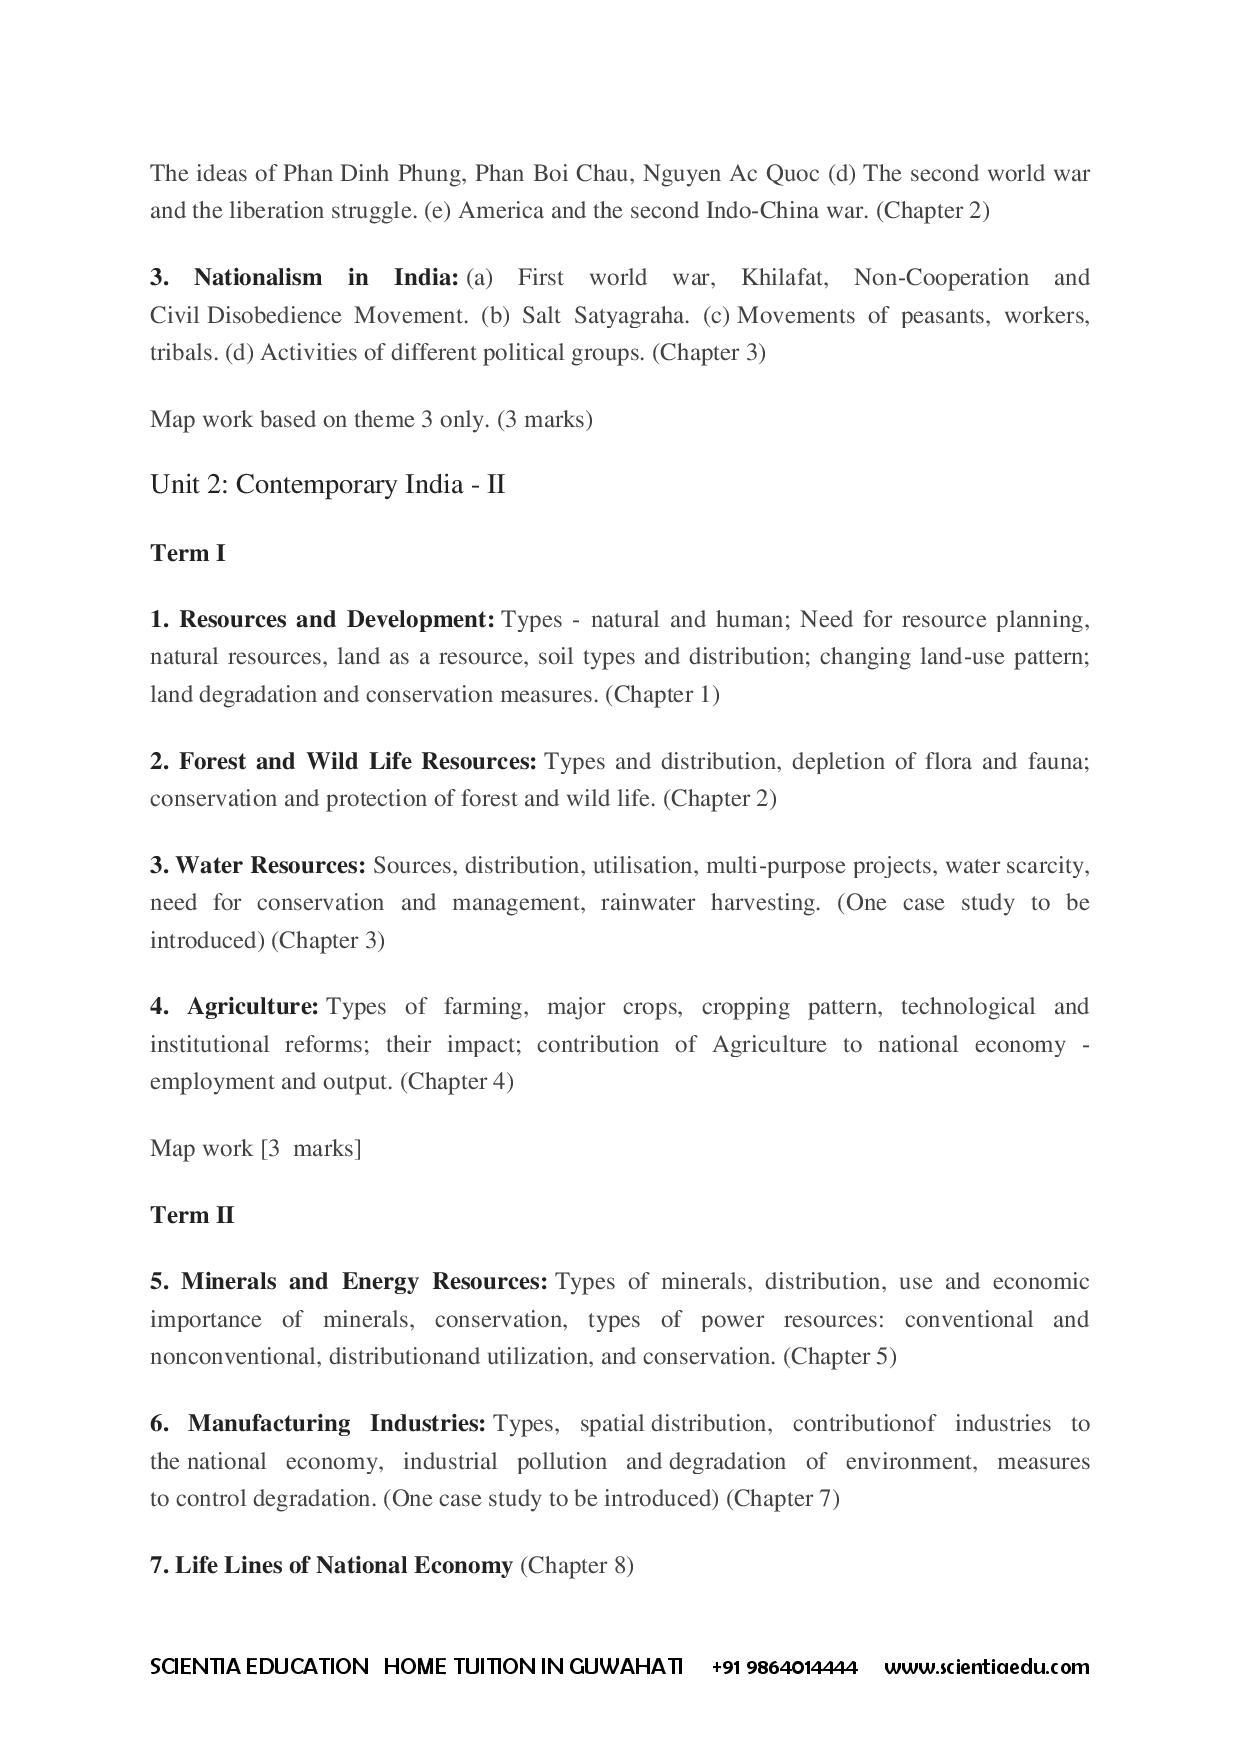 Math Worksheets Trigonometry trigonometry problems and questions – Math Worksheets Trigonometry